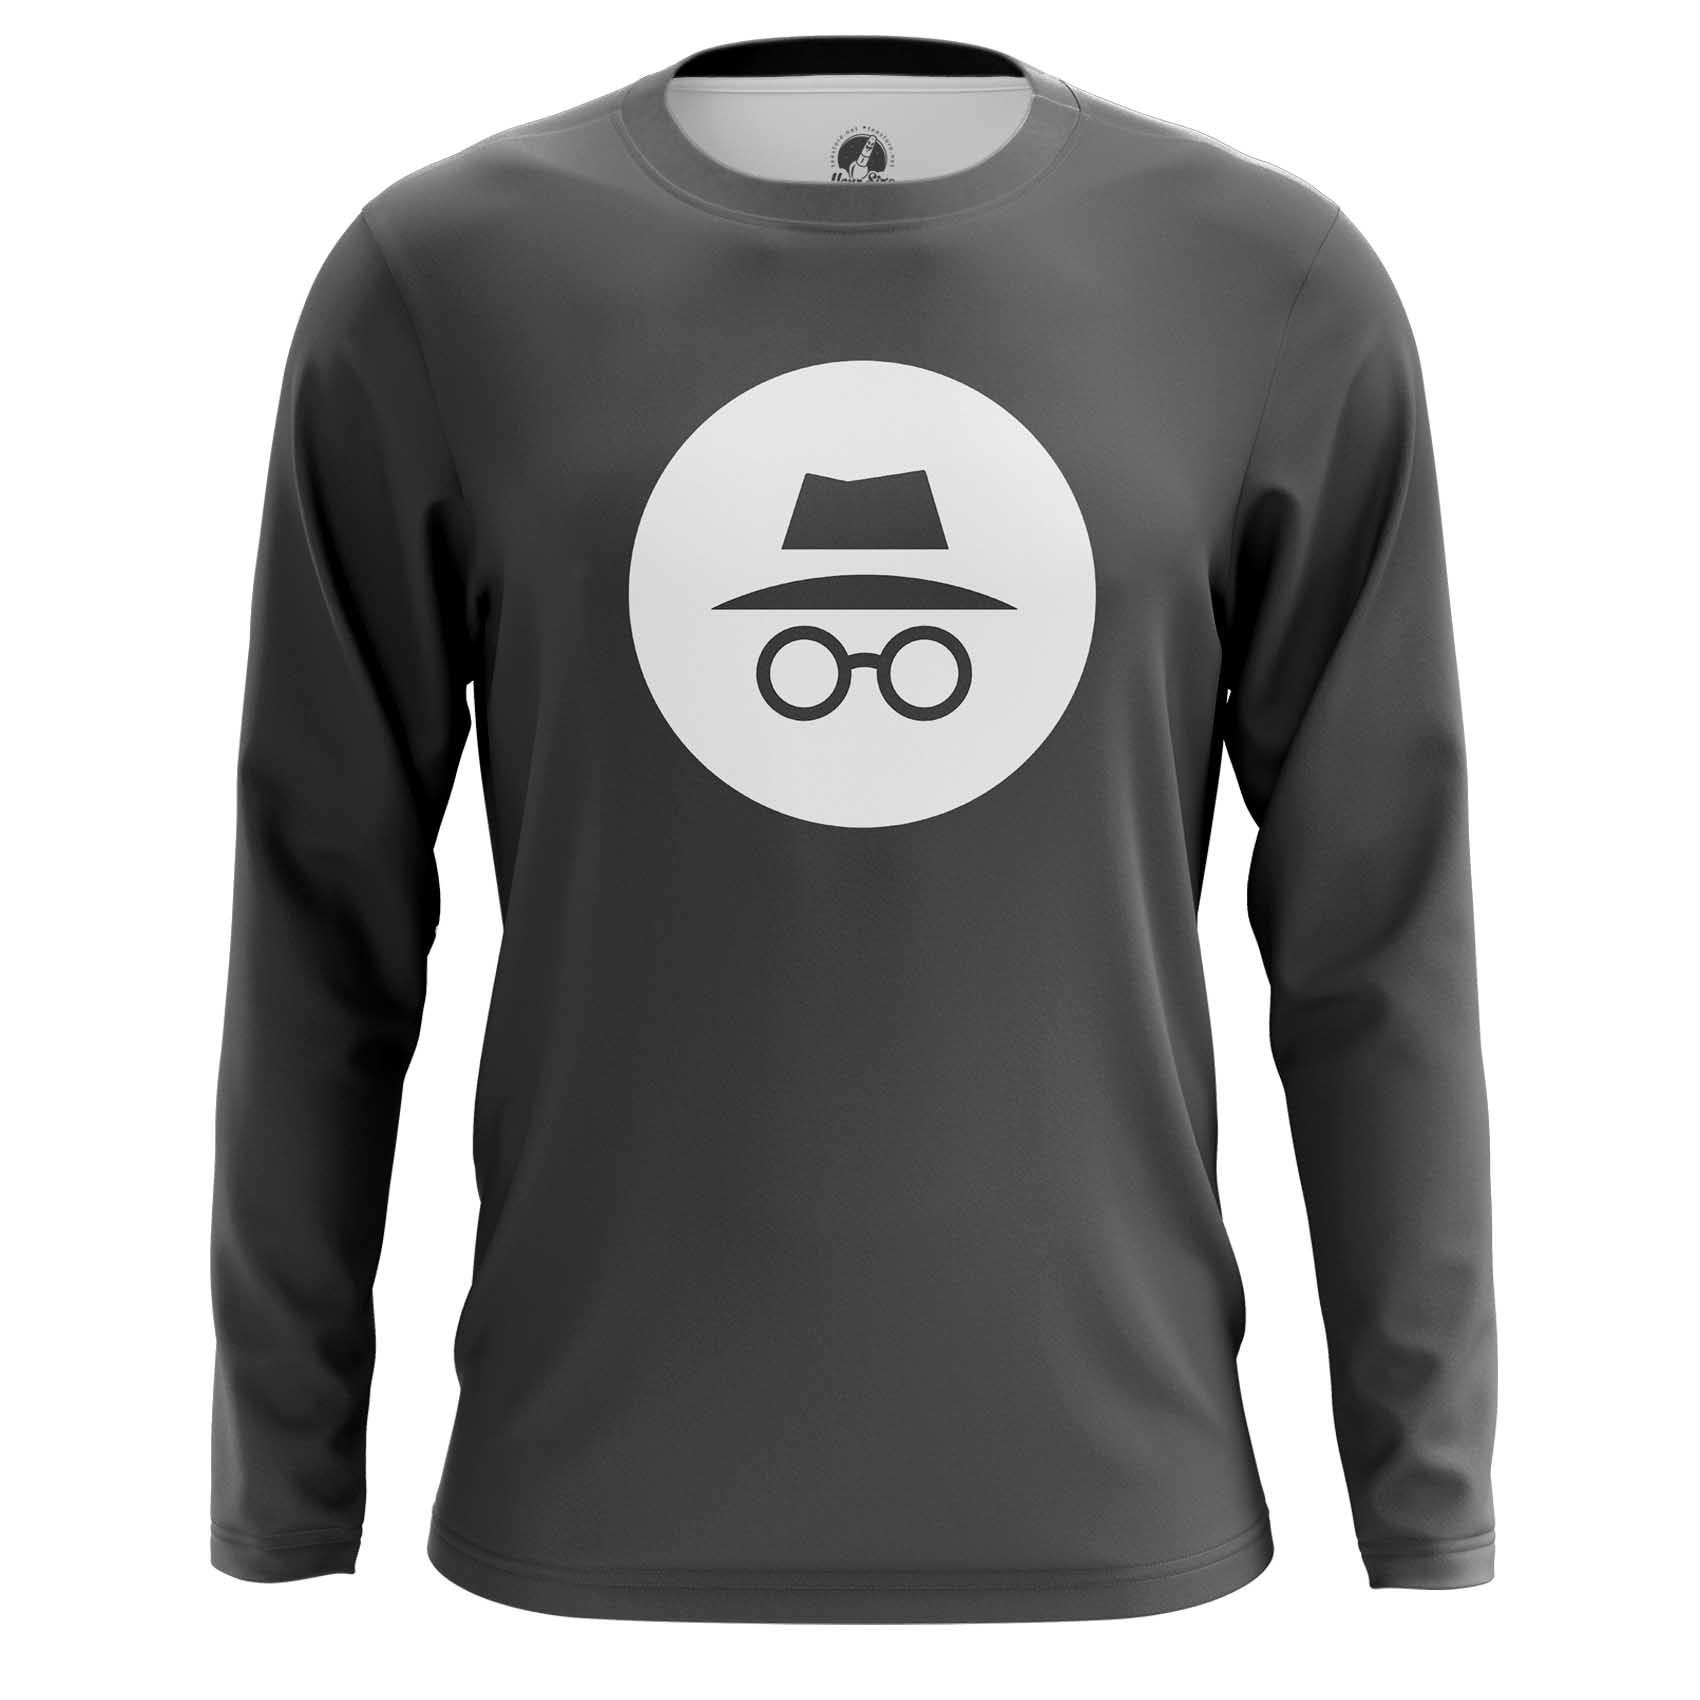 Merch Men'S T-Shirt Privacy Mode Incognito Web Fun Art Merch